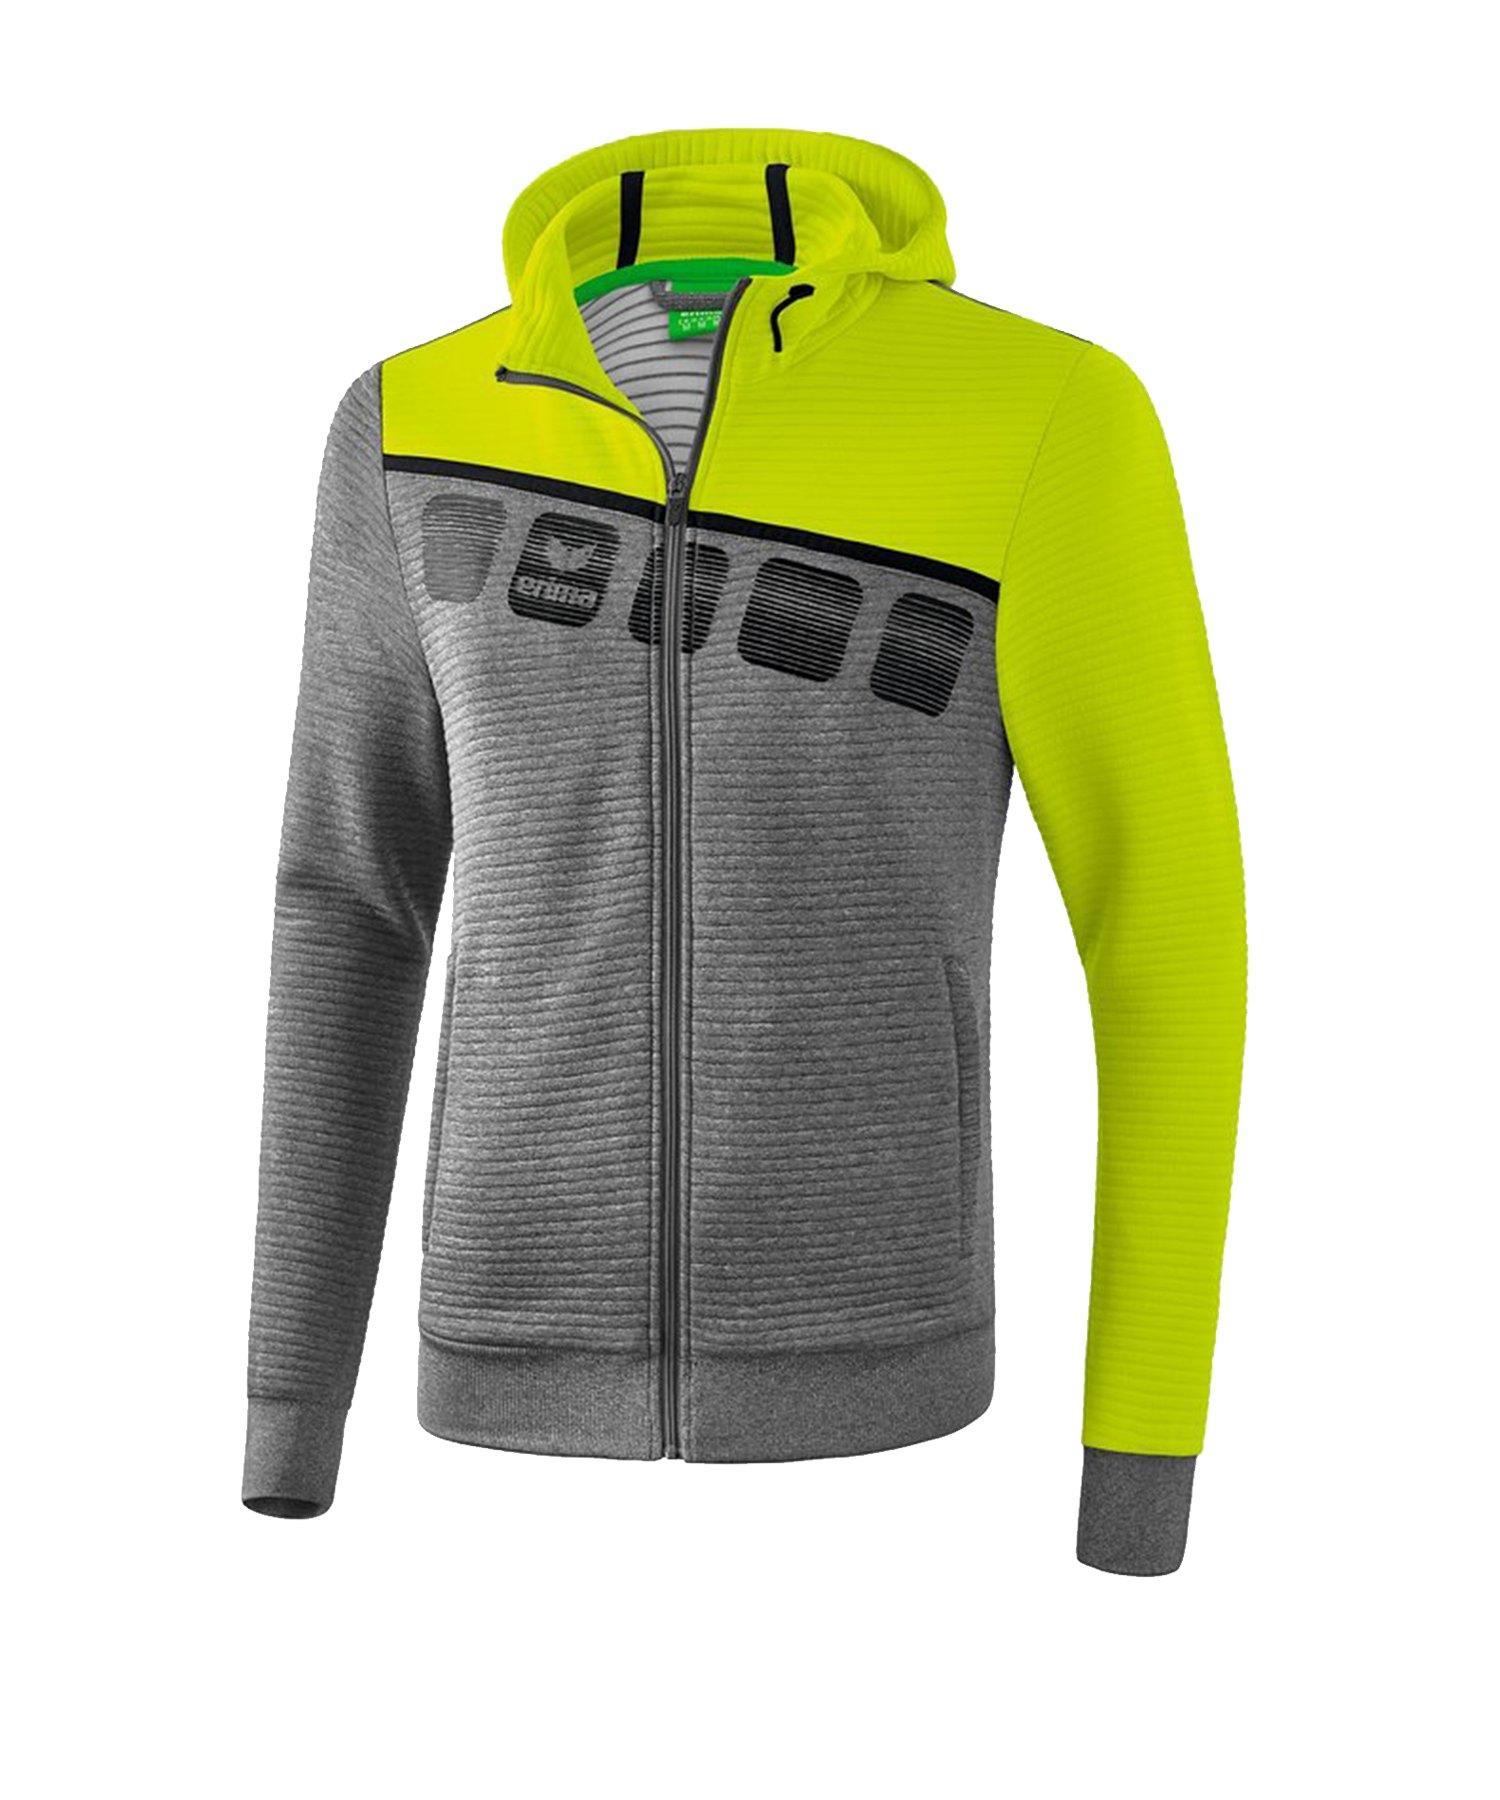 Erima 5-C Trainingsjacke mit Kapuze Kids Grau Grün - Grau